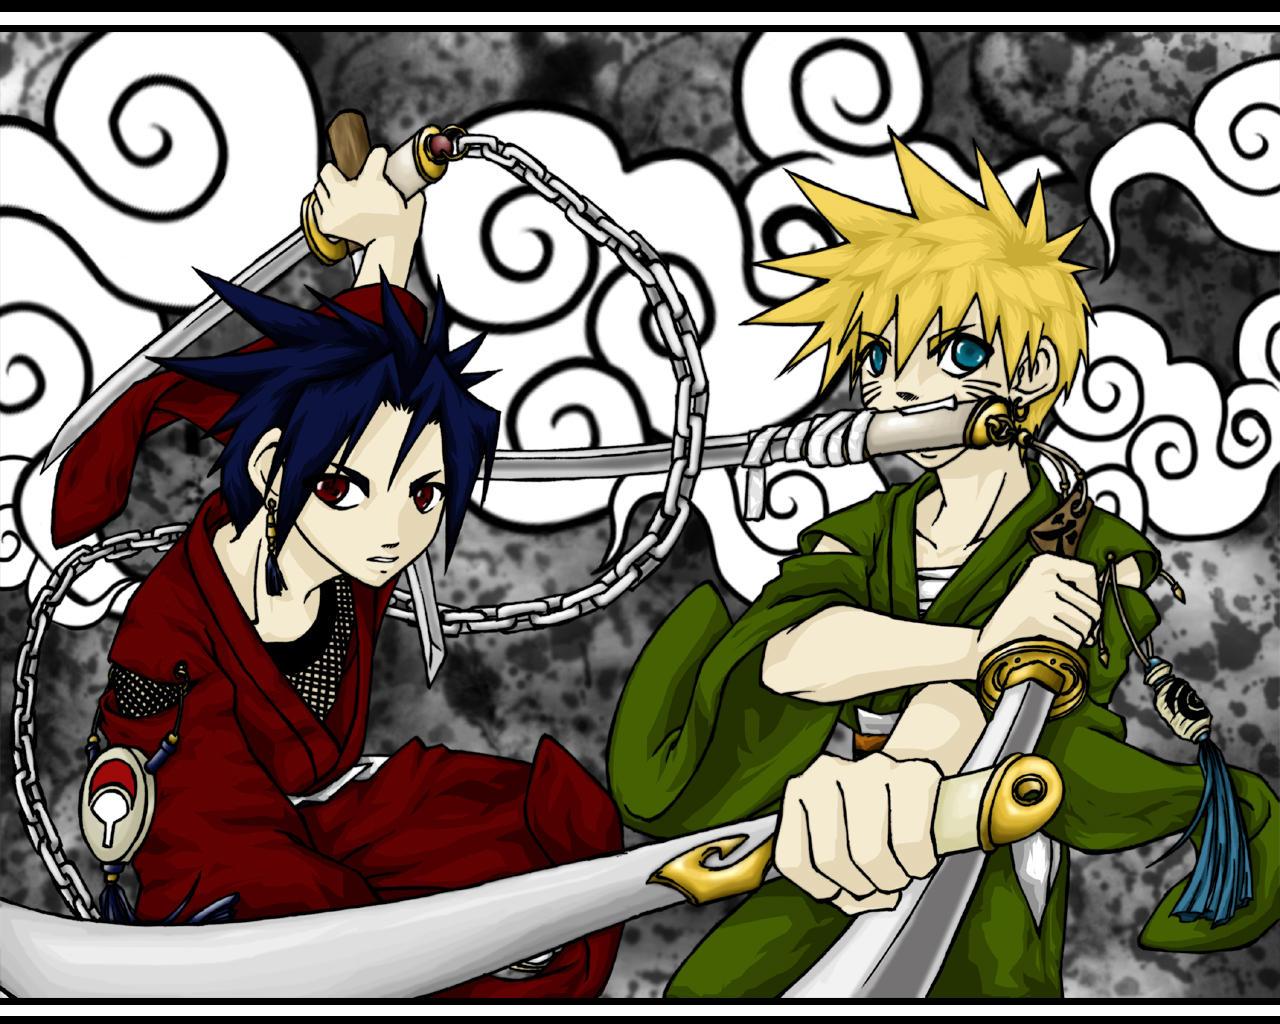 Wonderful Wallpaper Naruto Deviantart - naruto_and_sasuke_wallpaper_by_im_with_no_name  Graphic_265344.jpg